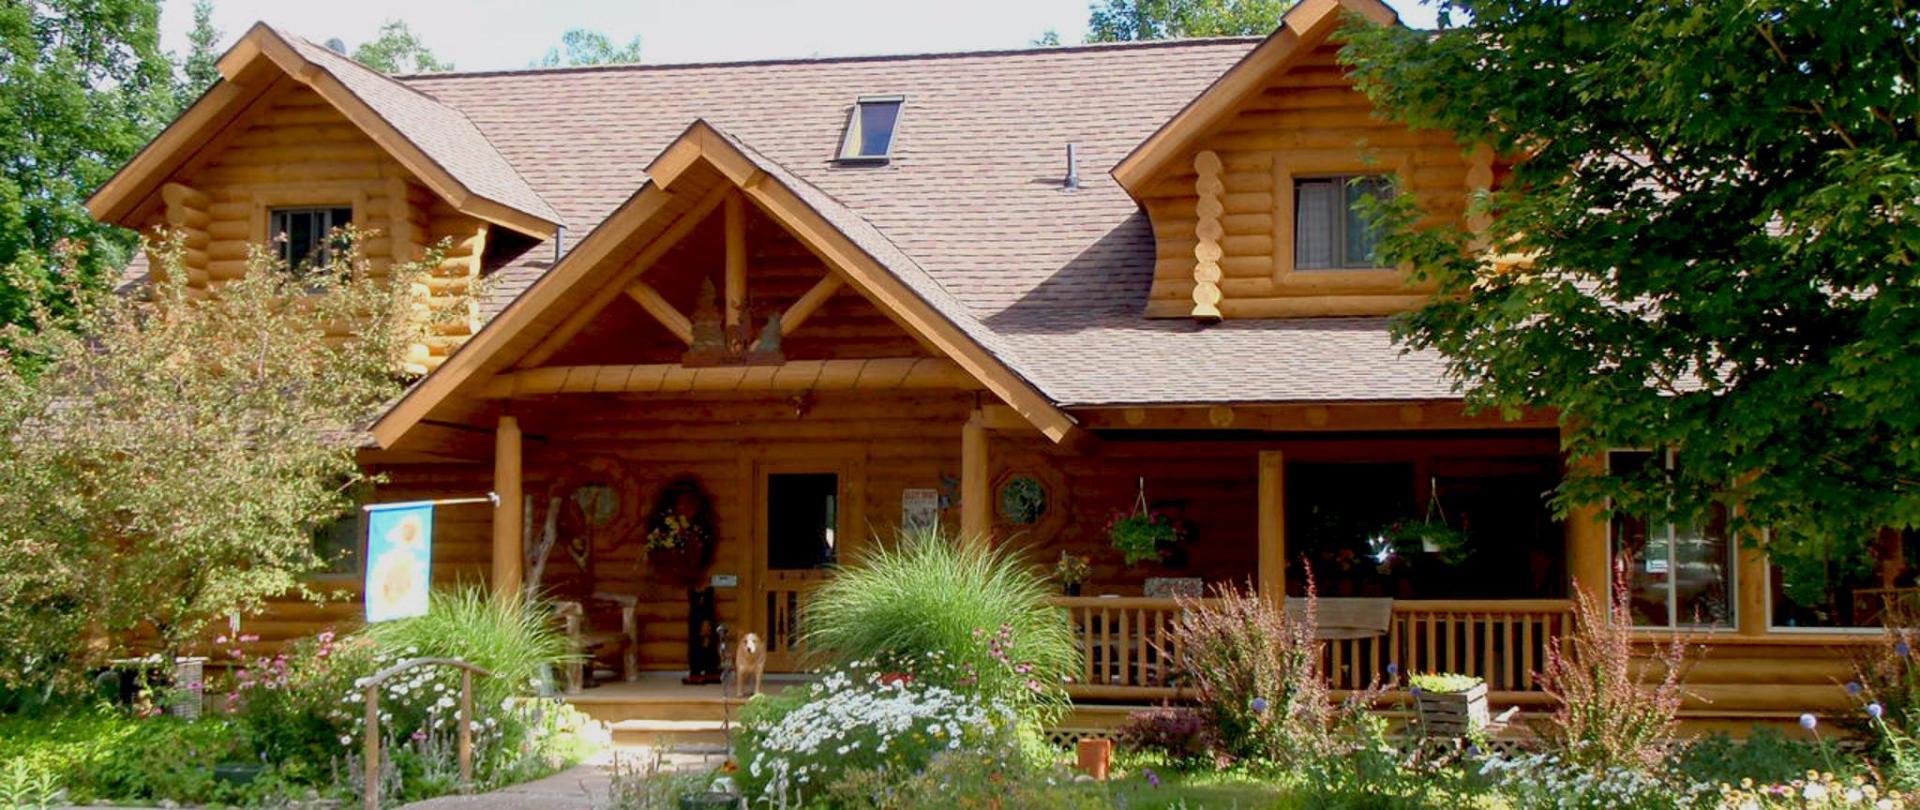 Lodge front.jpg